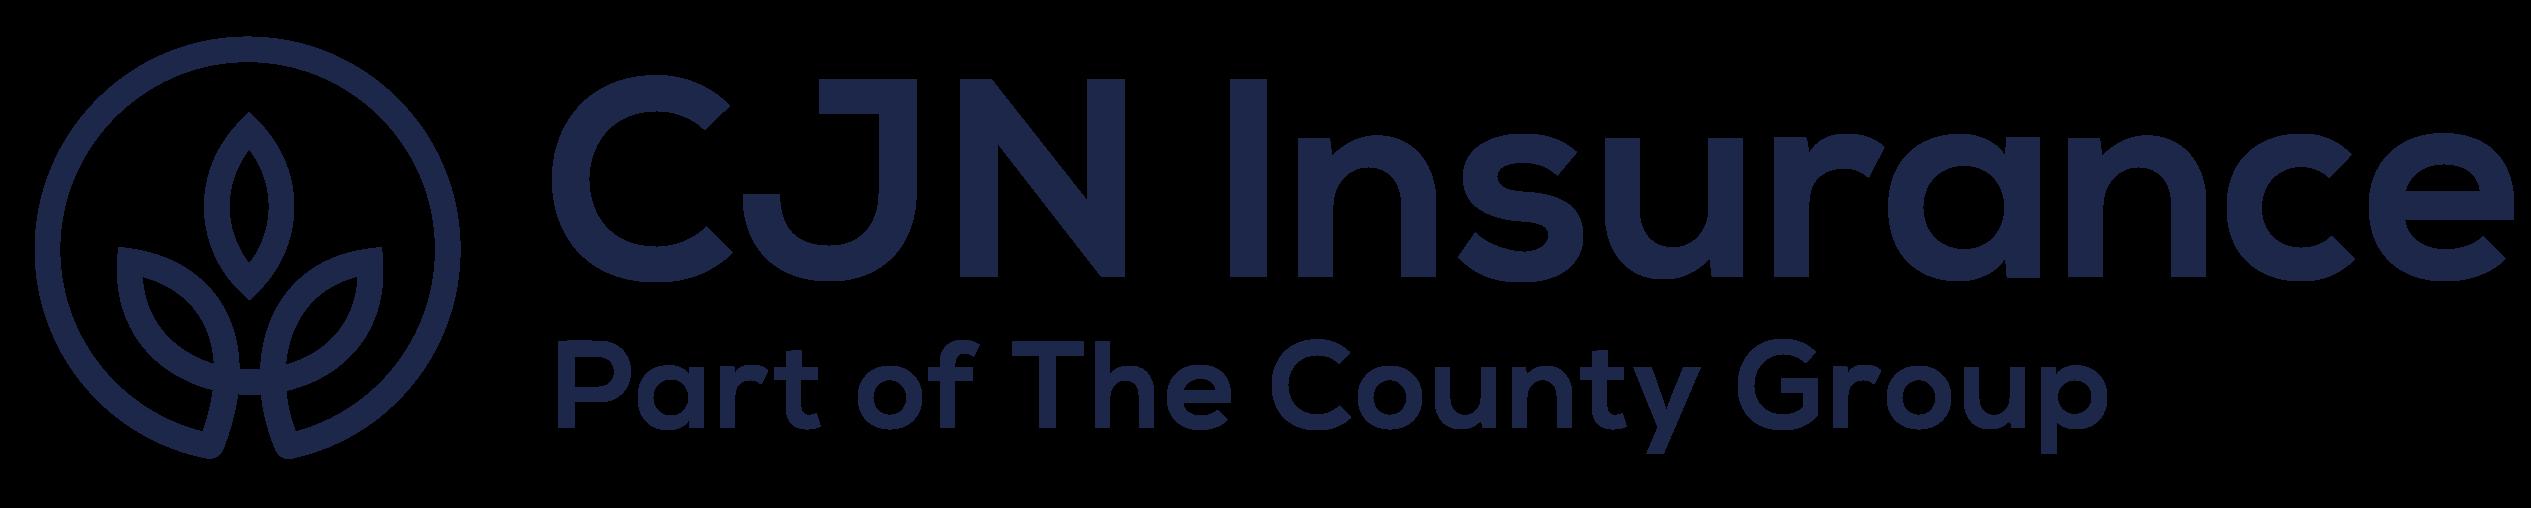 CJN Insurance Services